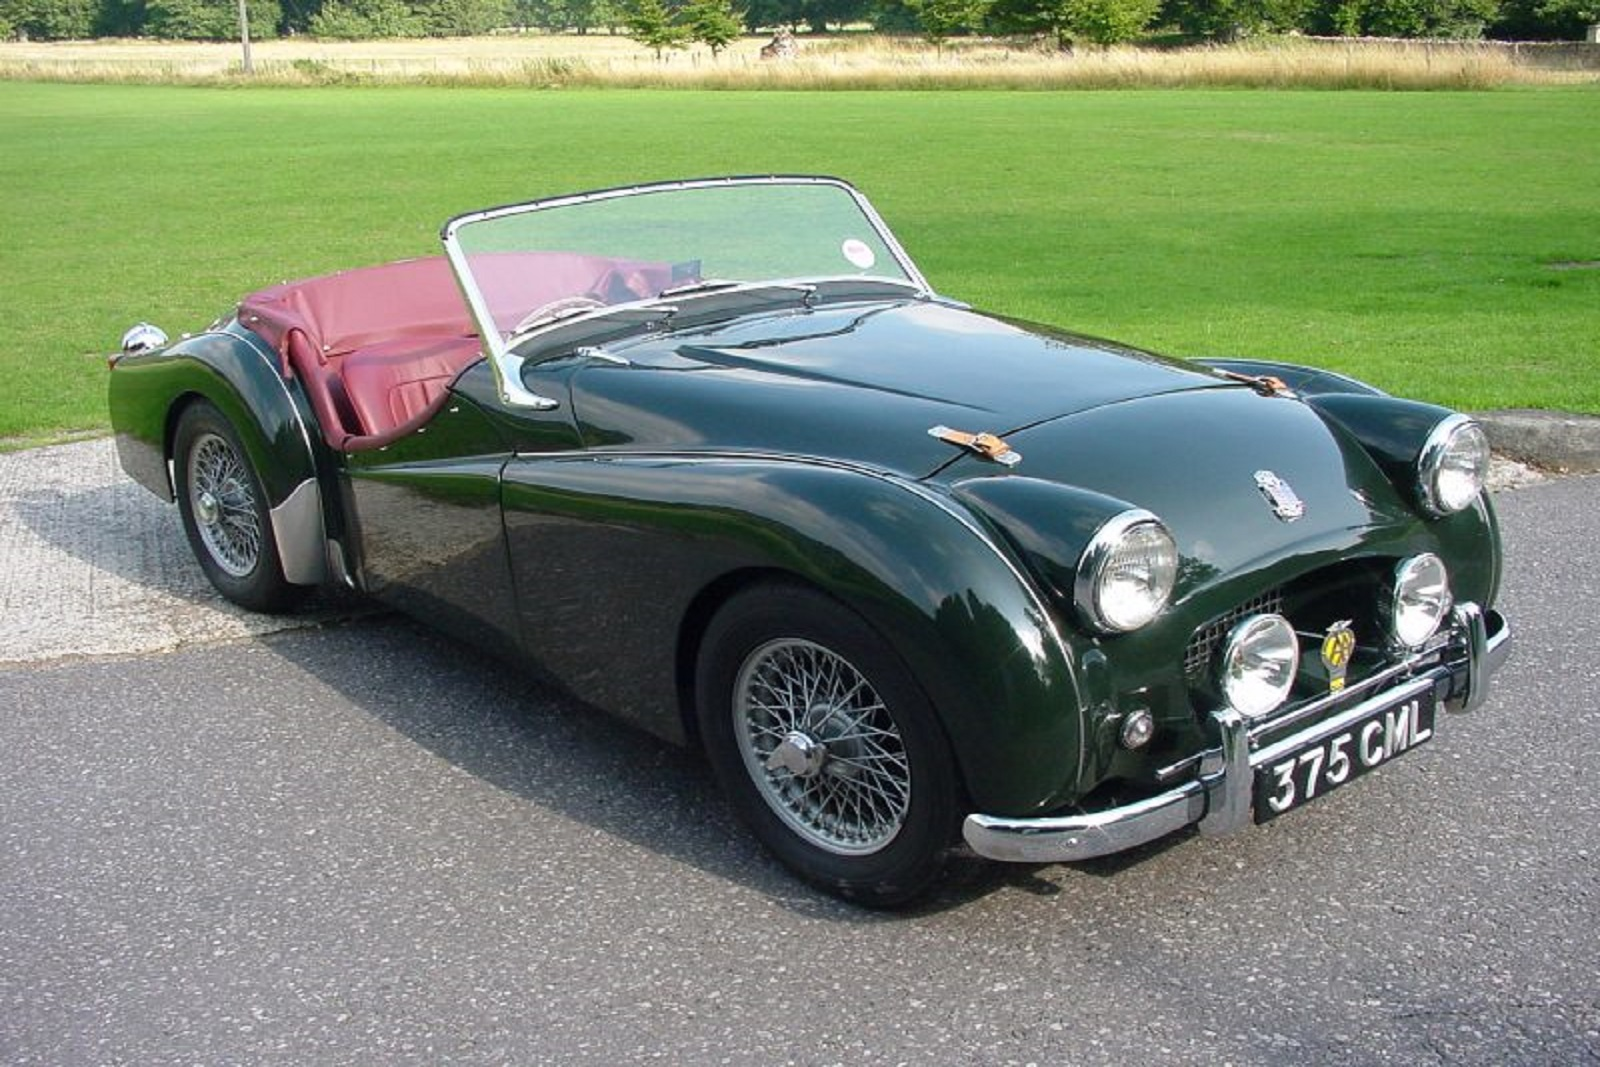 Voiture anglaise de collection Triumph Motor Company3 - Voiture anglaise de collection Triumph Motor Company